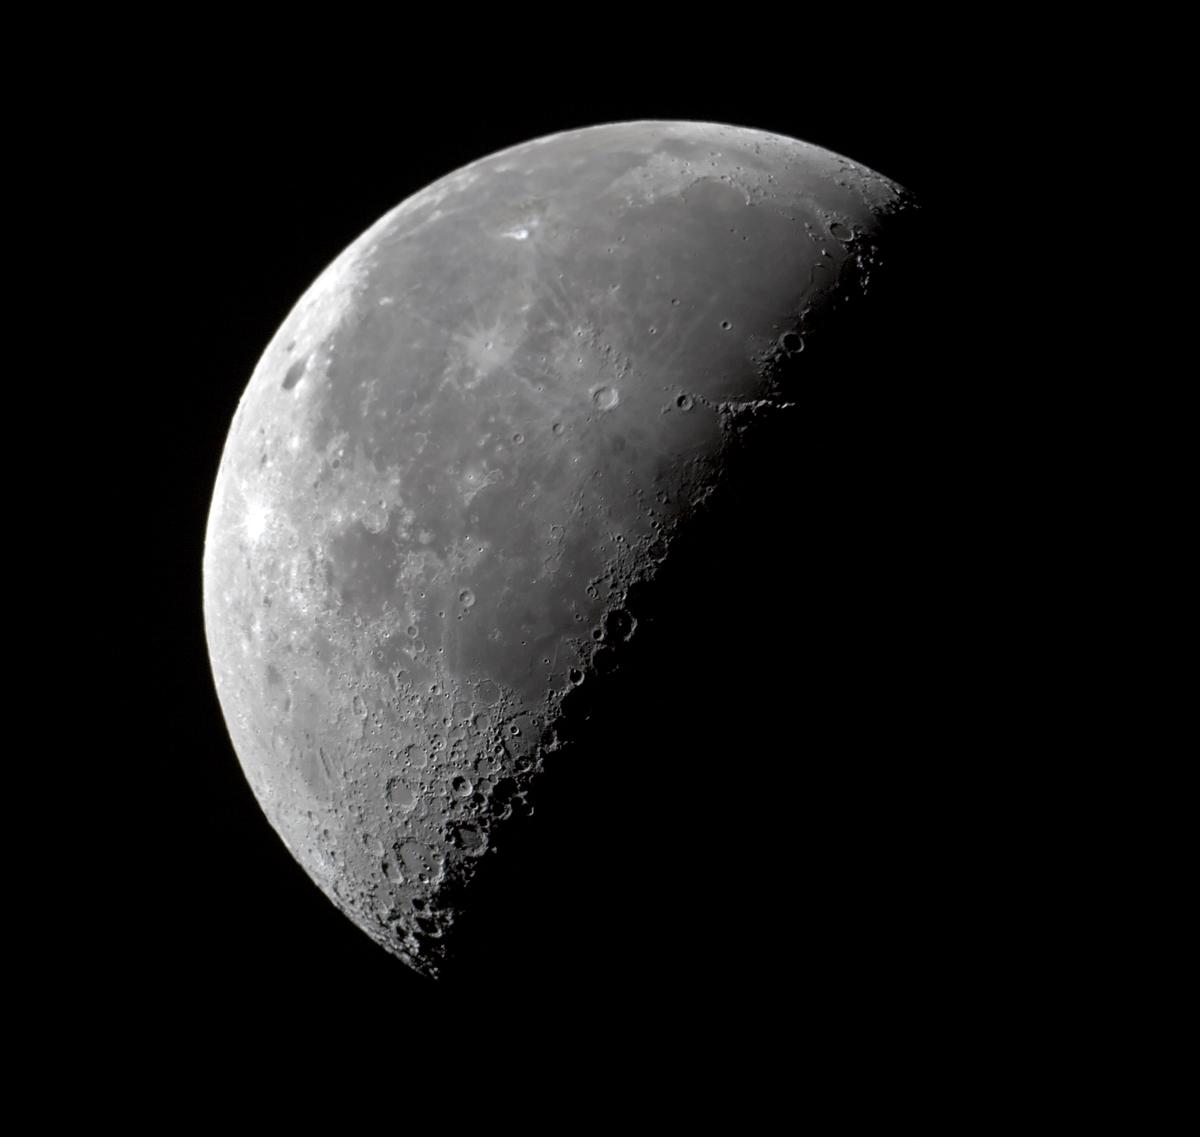 Moon magazine cuarto menguante for Cuarto menguante de la luna